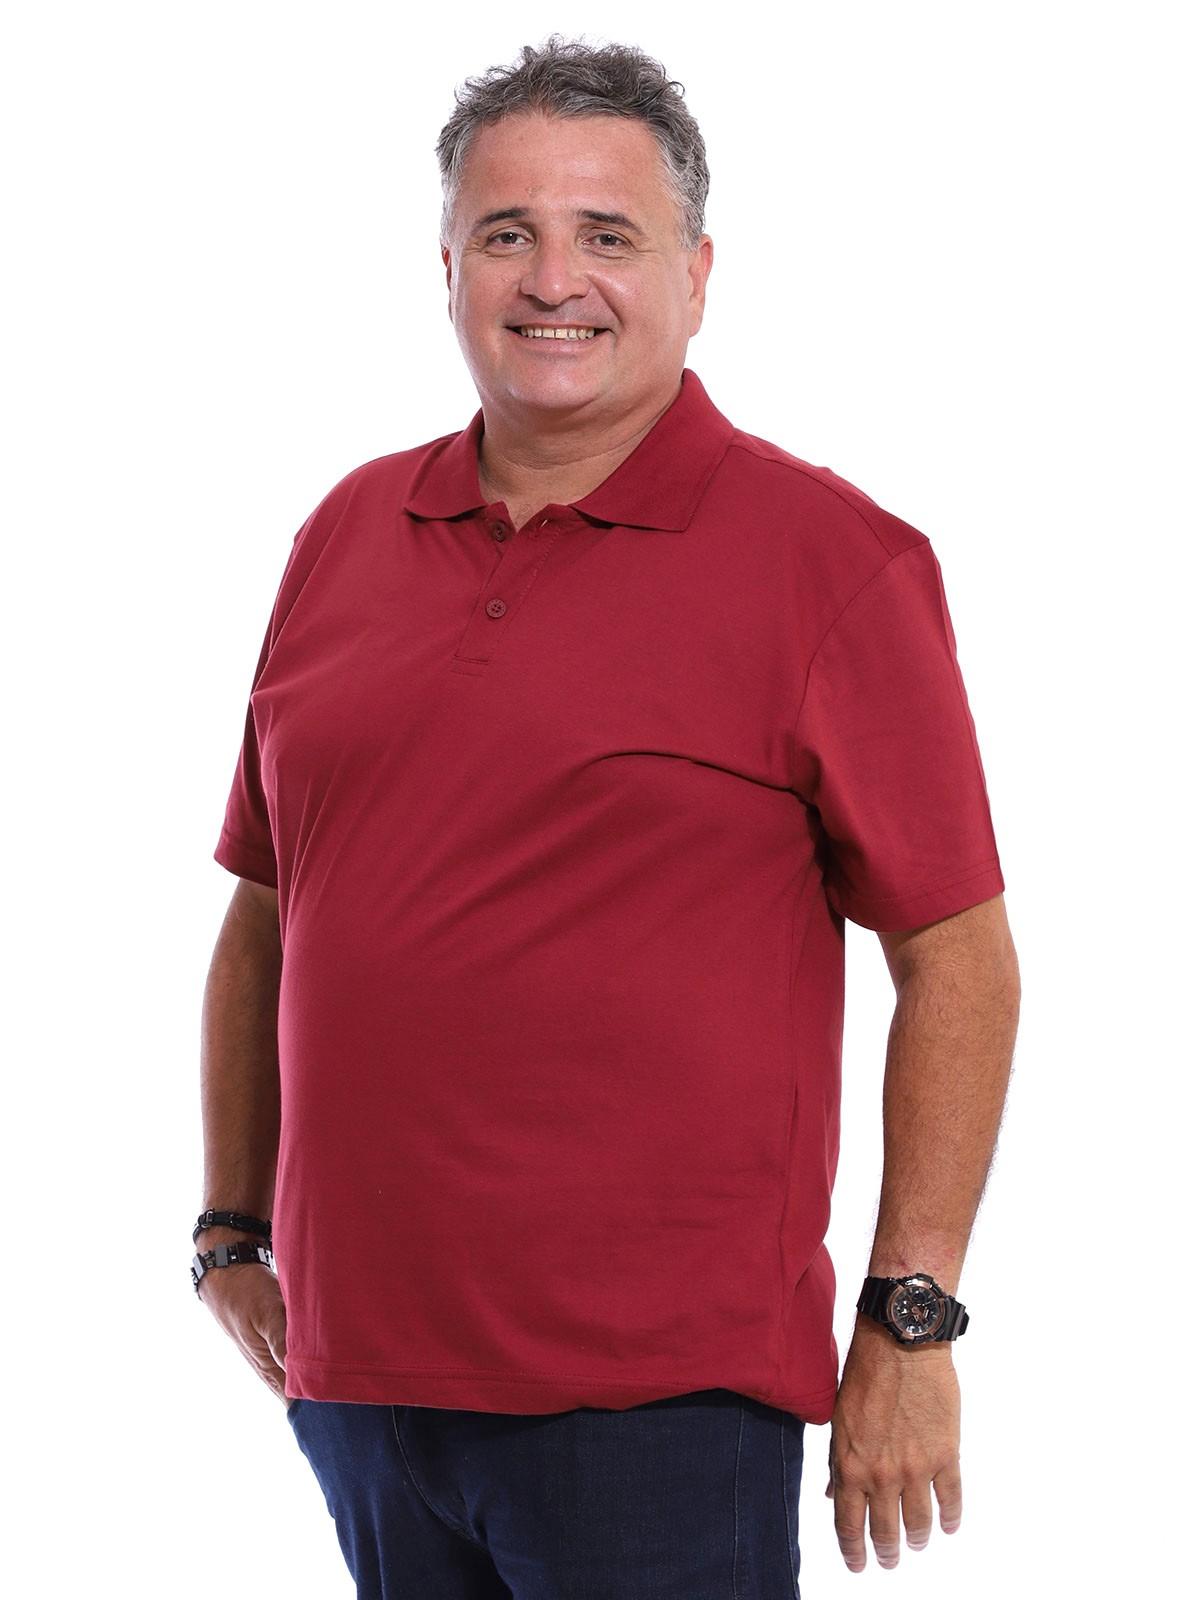 Camisa Polo Plus Size Masculina Lisa Básica Algodão Bordo